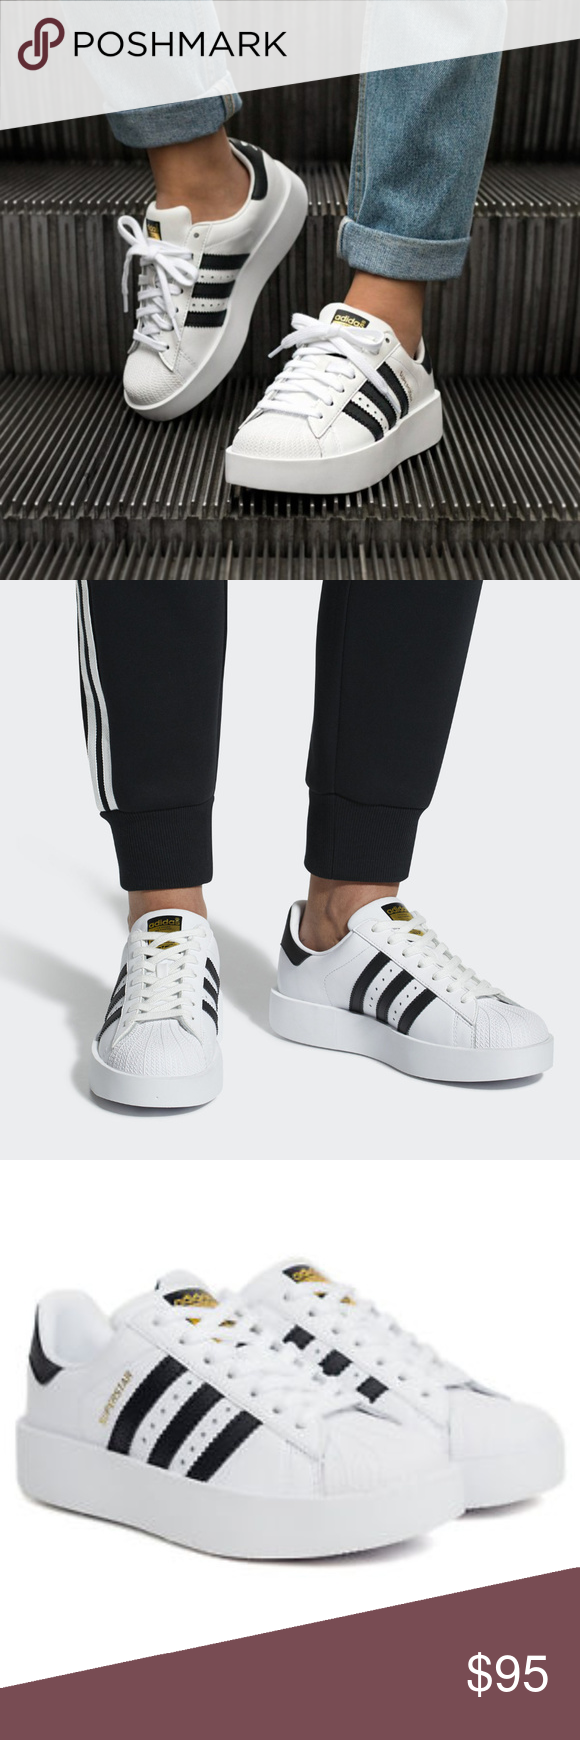 Adidas superstar piattaforma scarpe nwt superstar scarpe